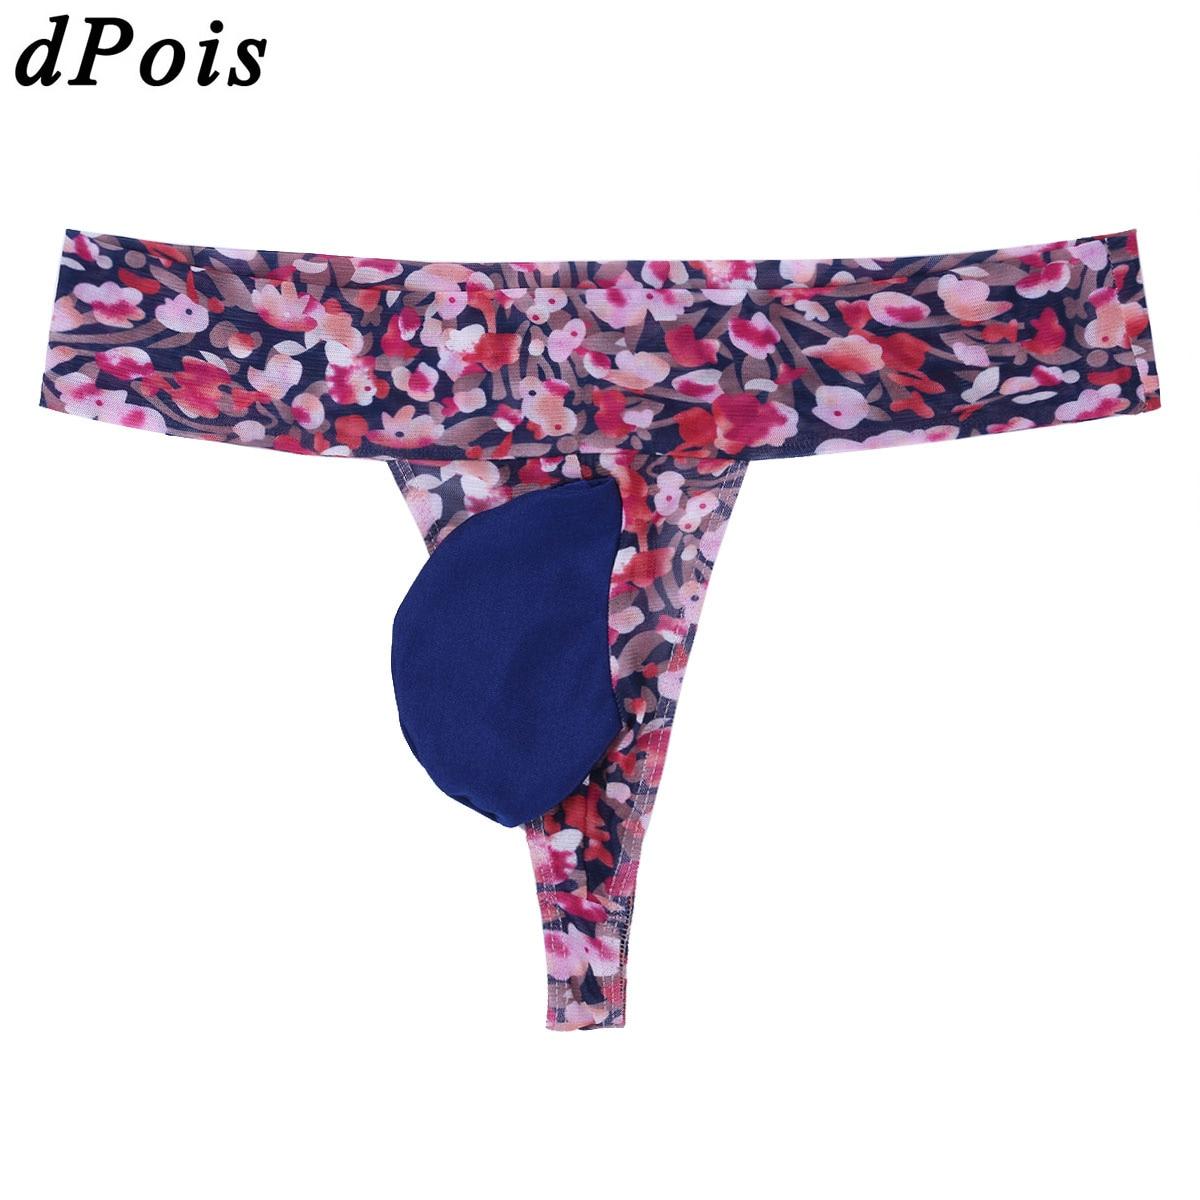 ea1d733315c5 Men Bikini Sexy Underwear with Penis Pouch U Convex Briefs Mens Soft Plum  Pattern G string